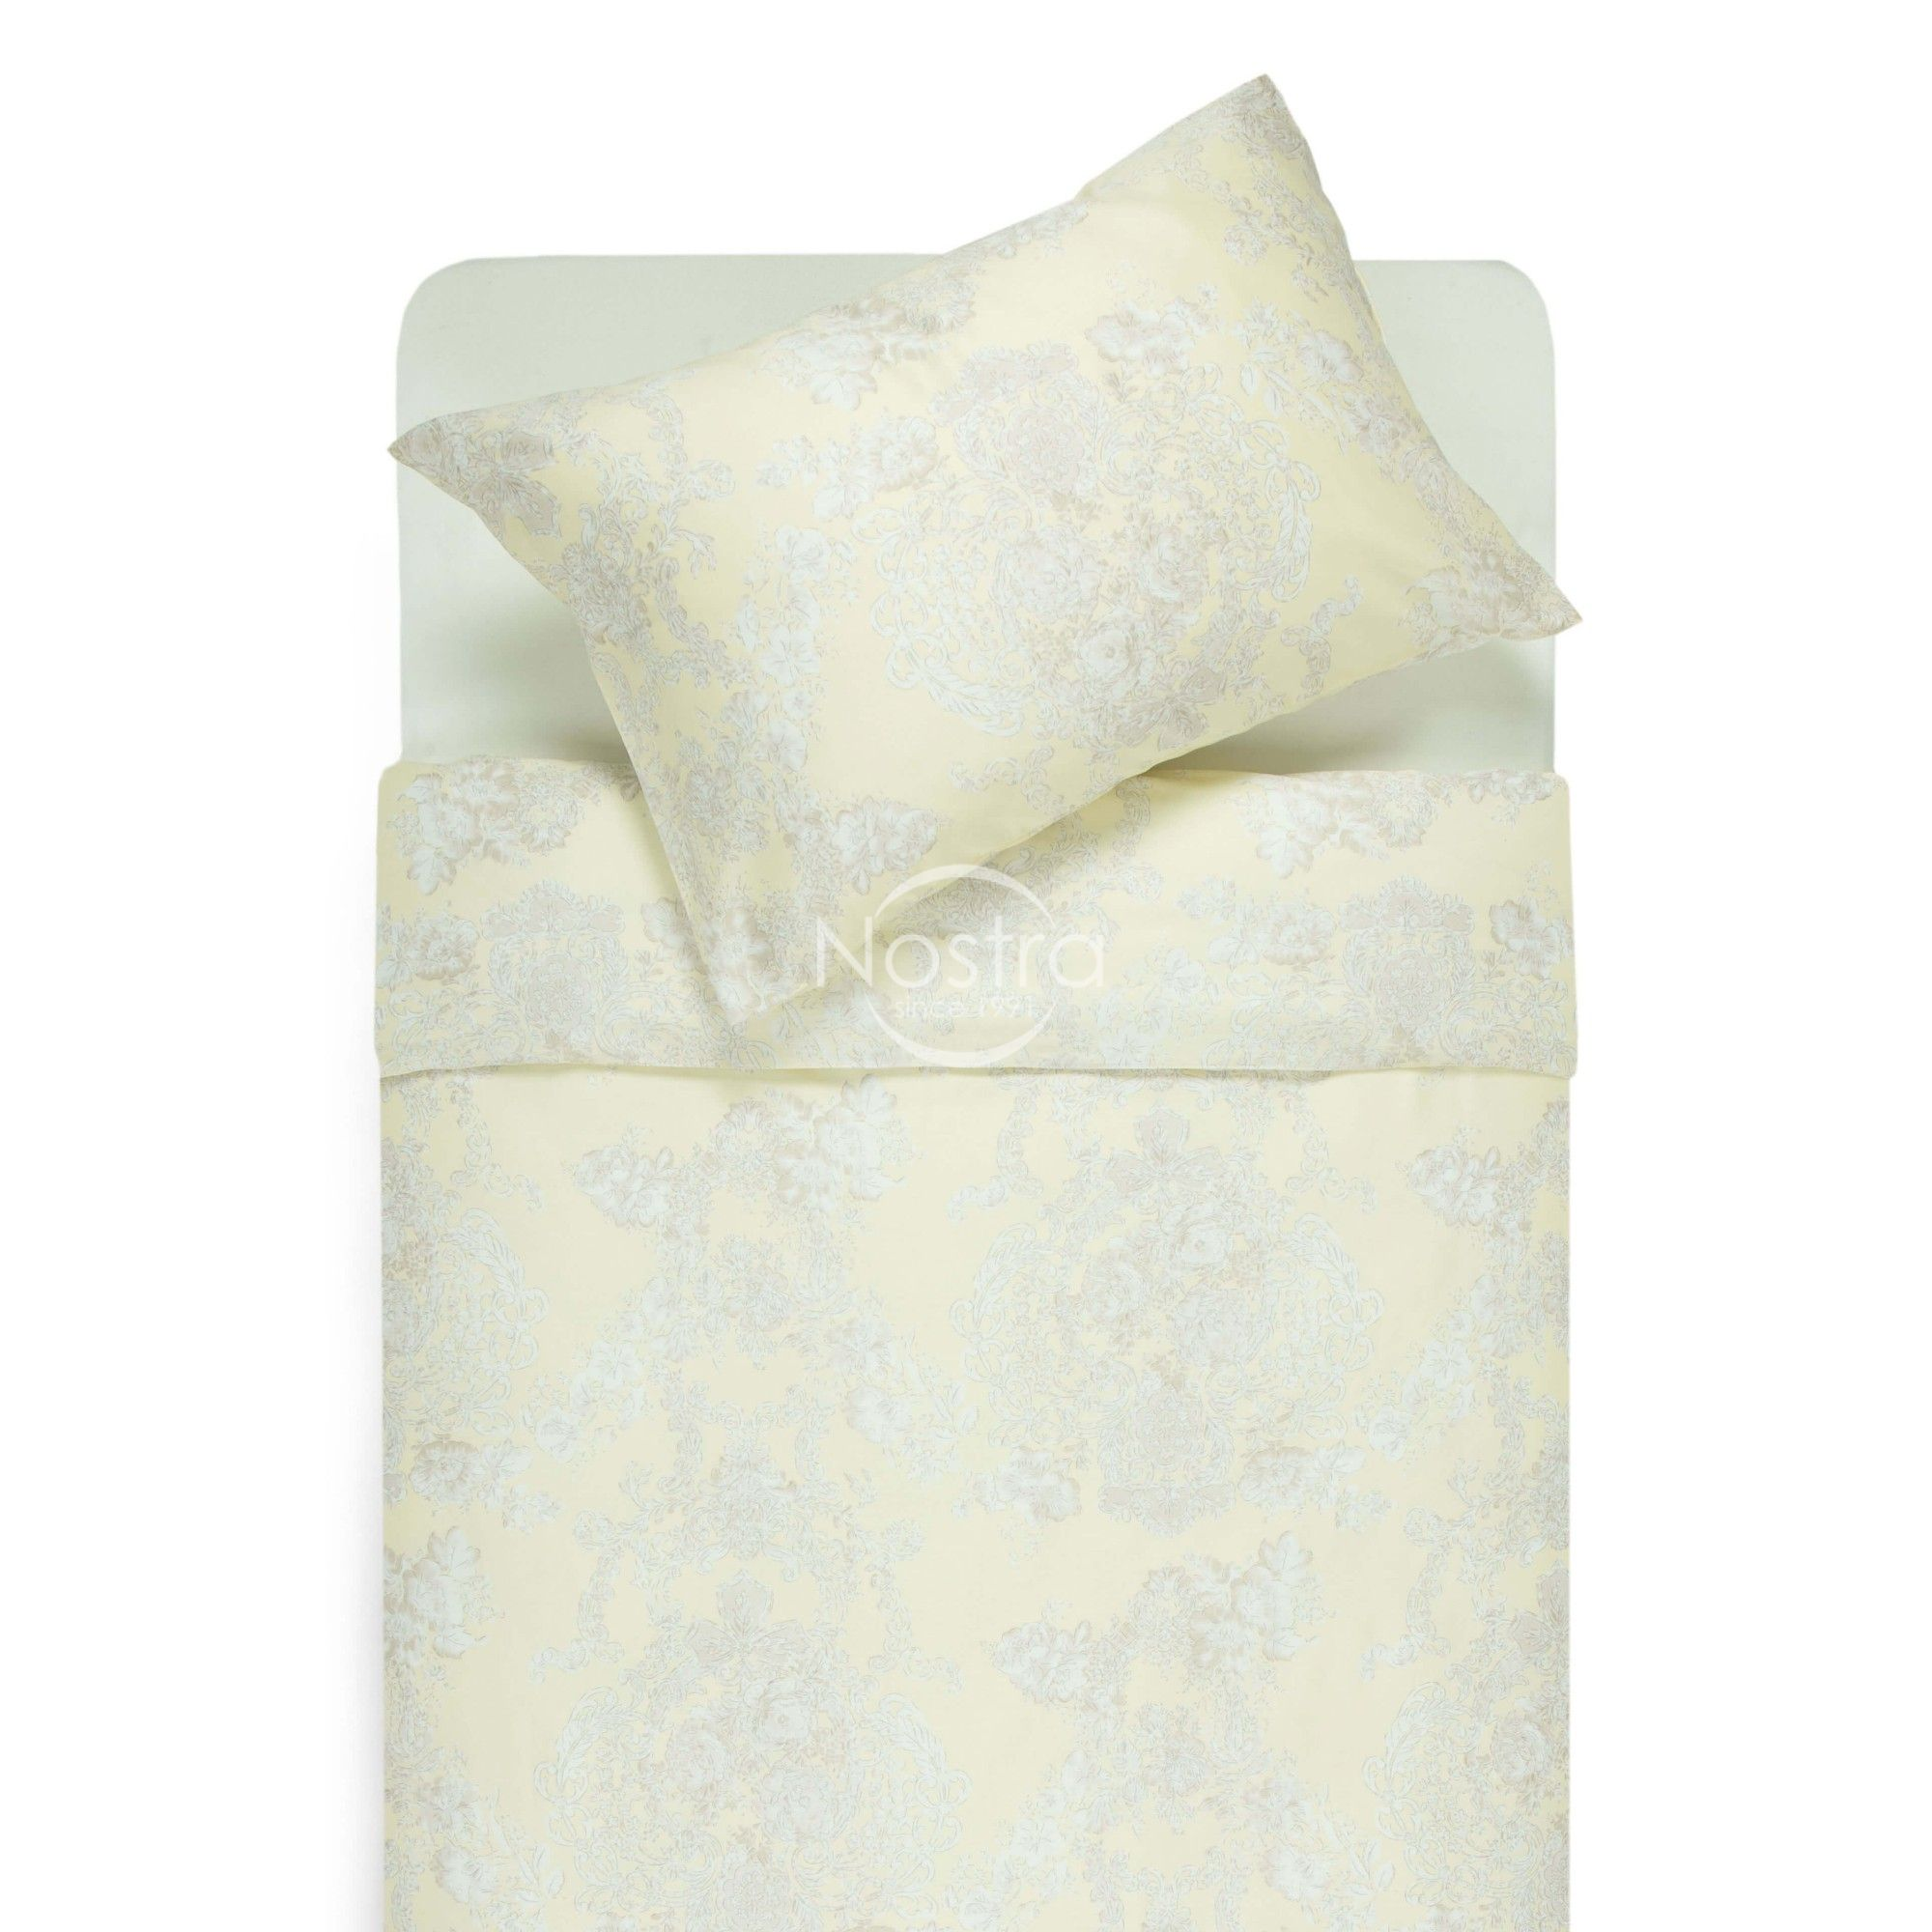 Mako satīna gultas veļa CECILIA 40-0876-BEIGE